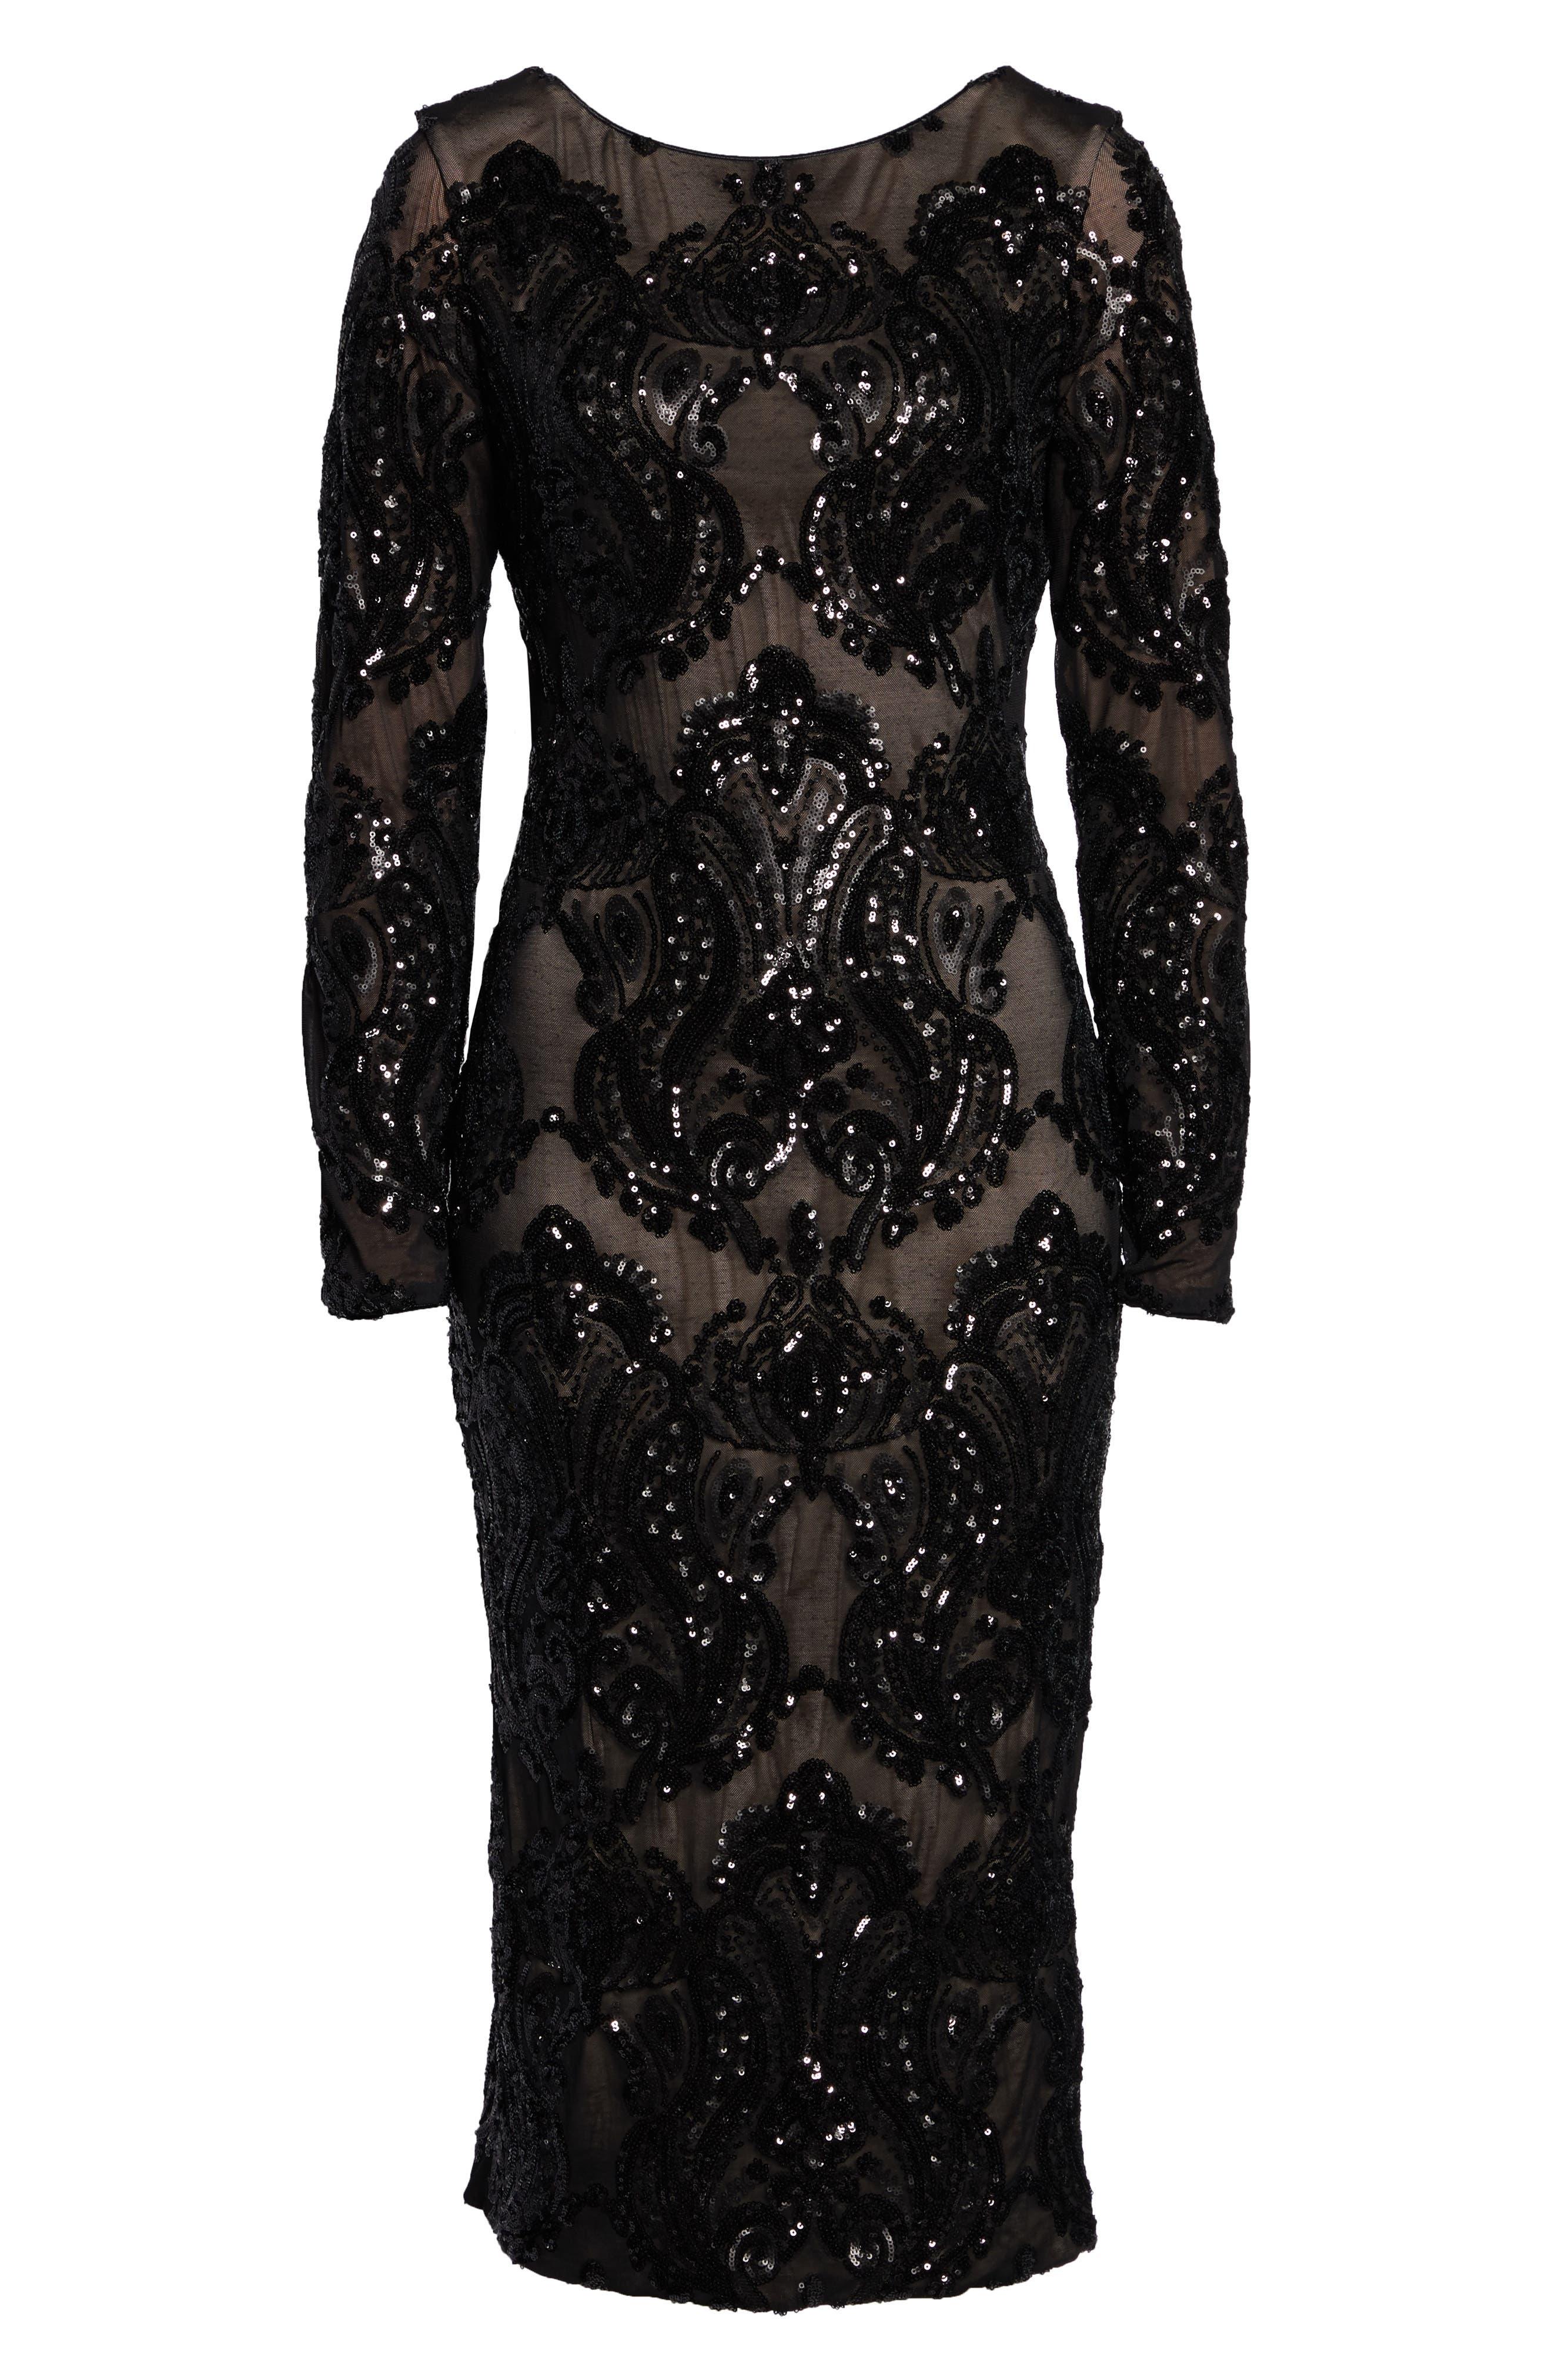 DRESS THE POPULATION, Emery Sequin Sheath Dress, Alternate thumbnail 5, color, BLACK/ NUDE